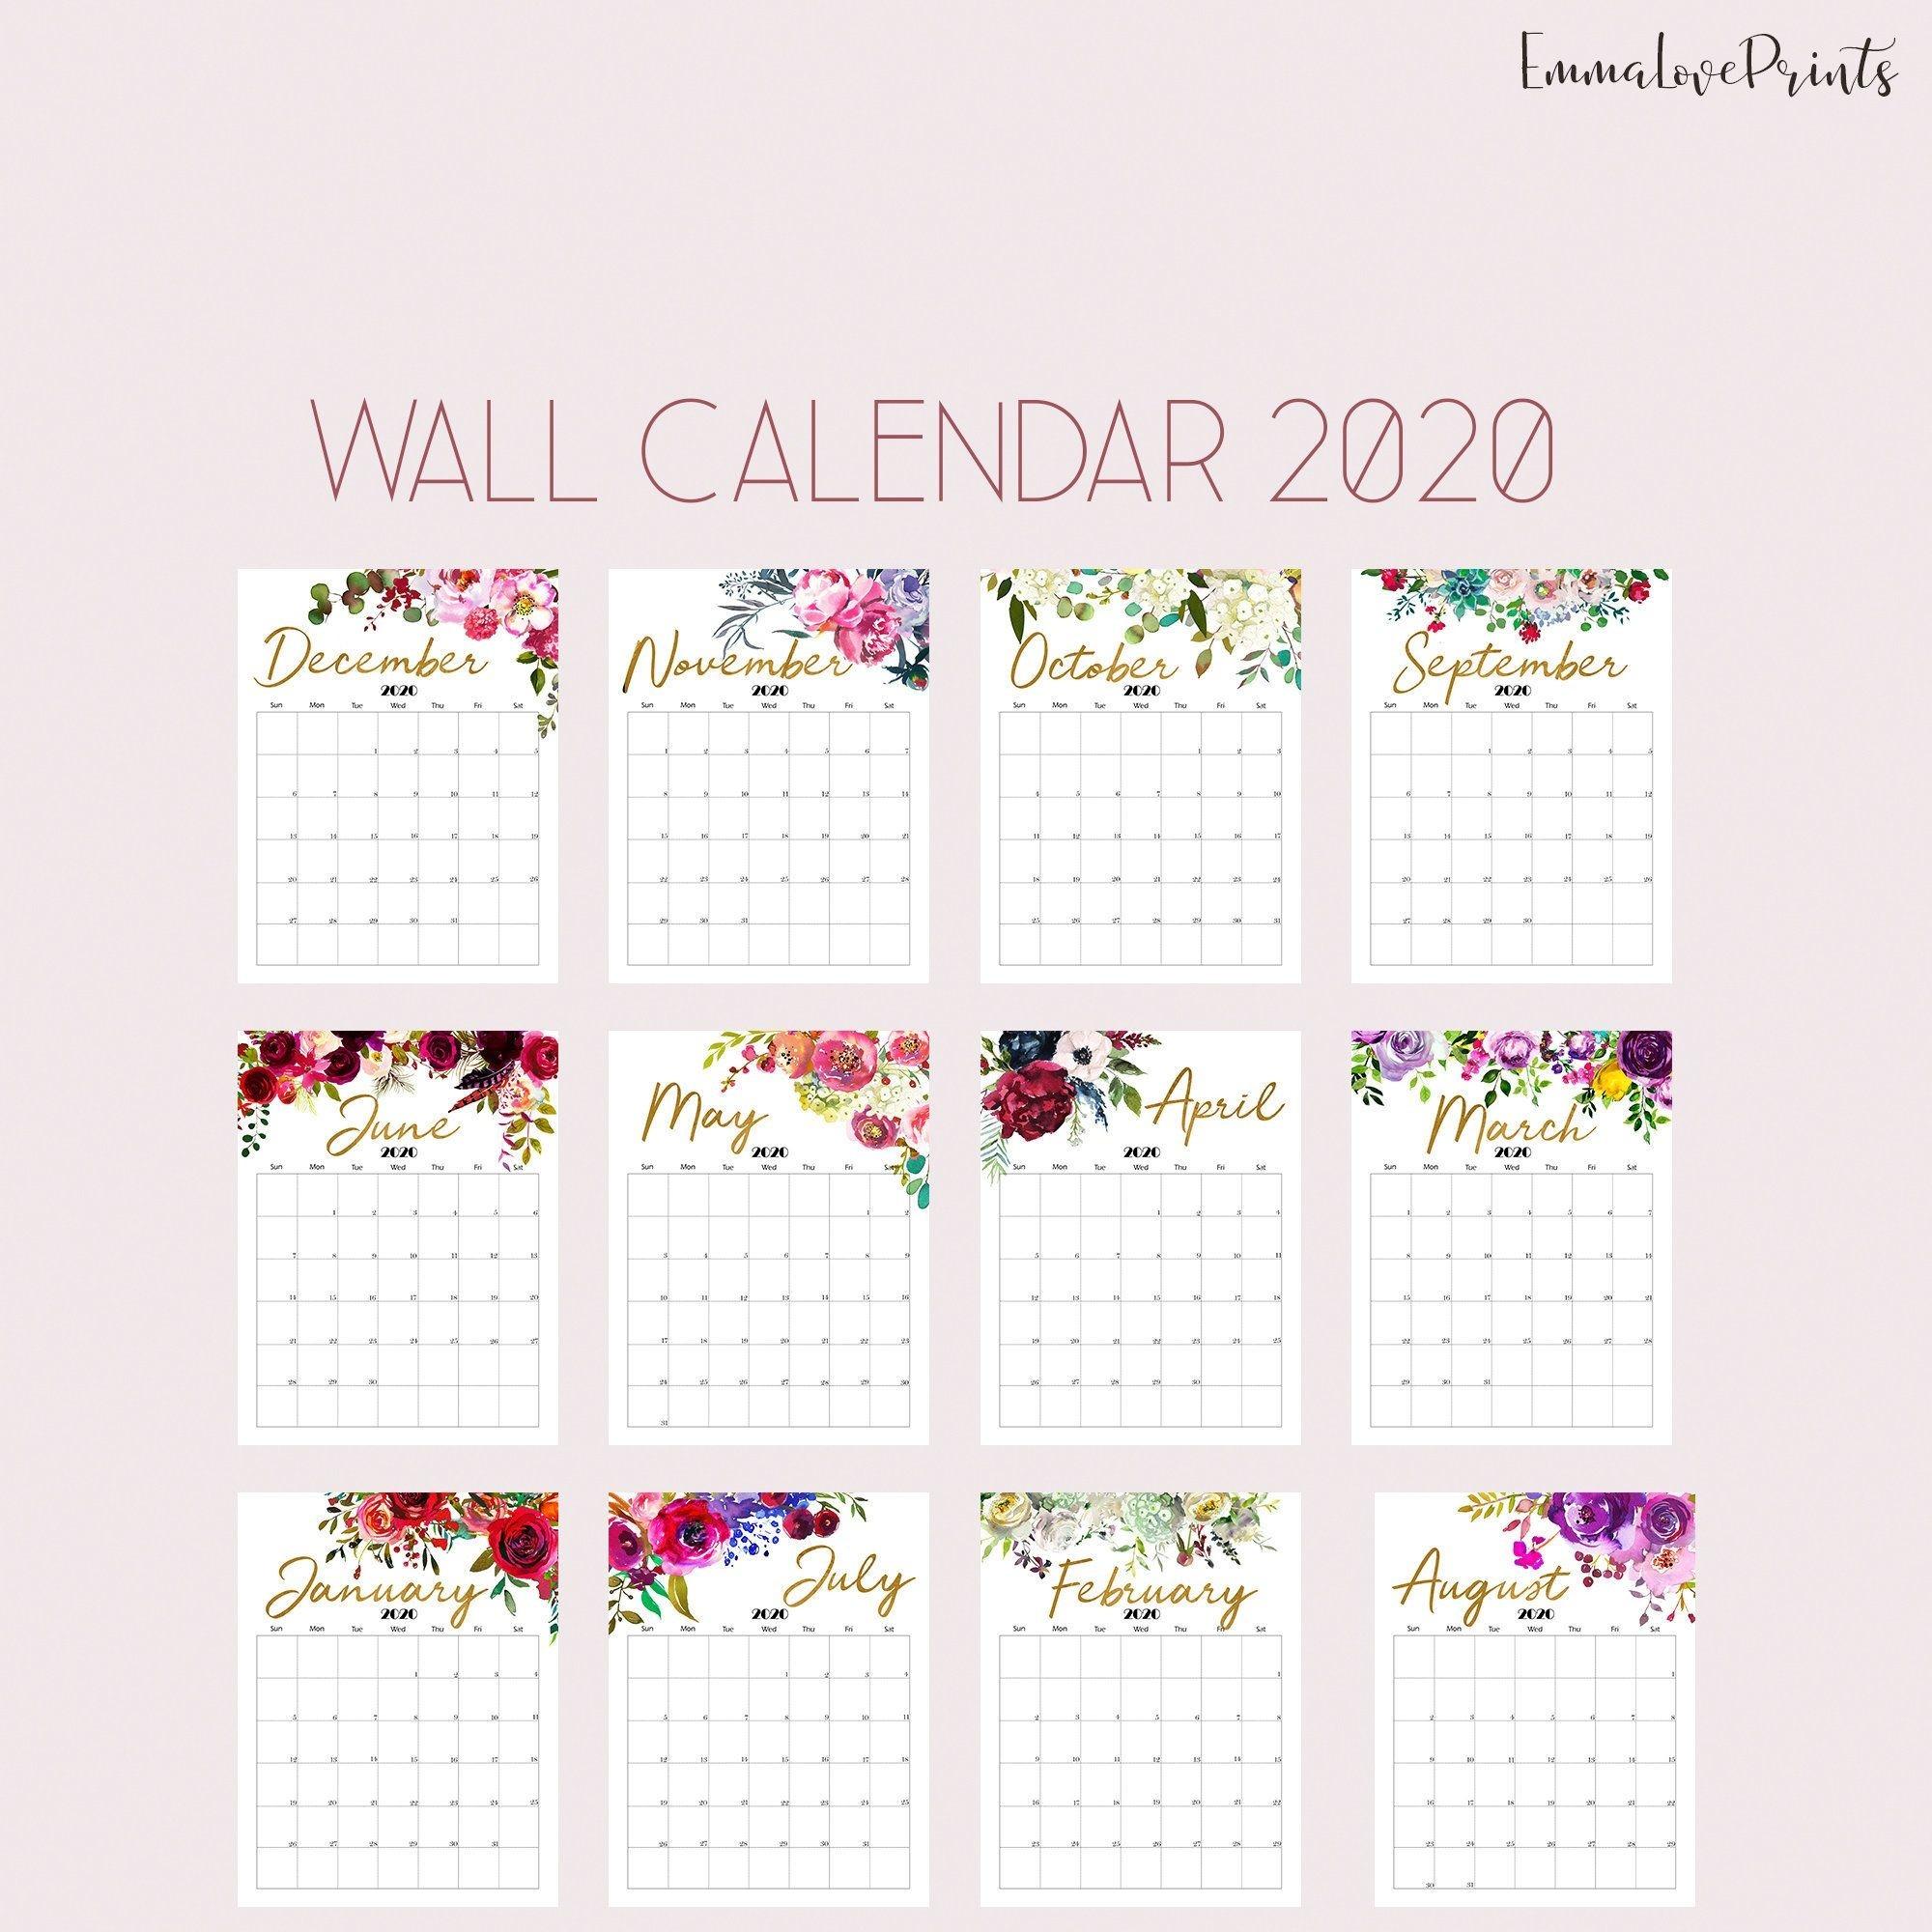 Printable Calendar 2020 Wall Calendar 2020 Desk Calendar-Pretty Monthly Calendar 2020